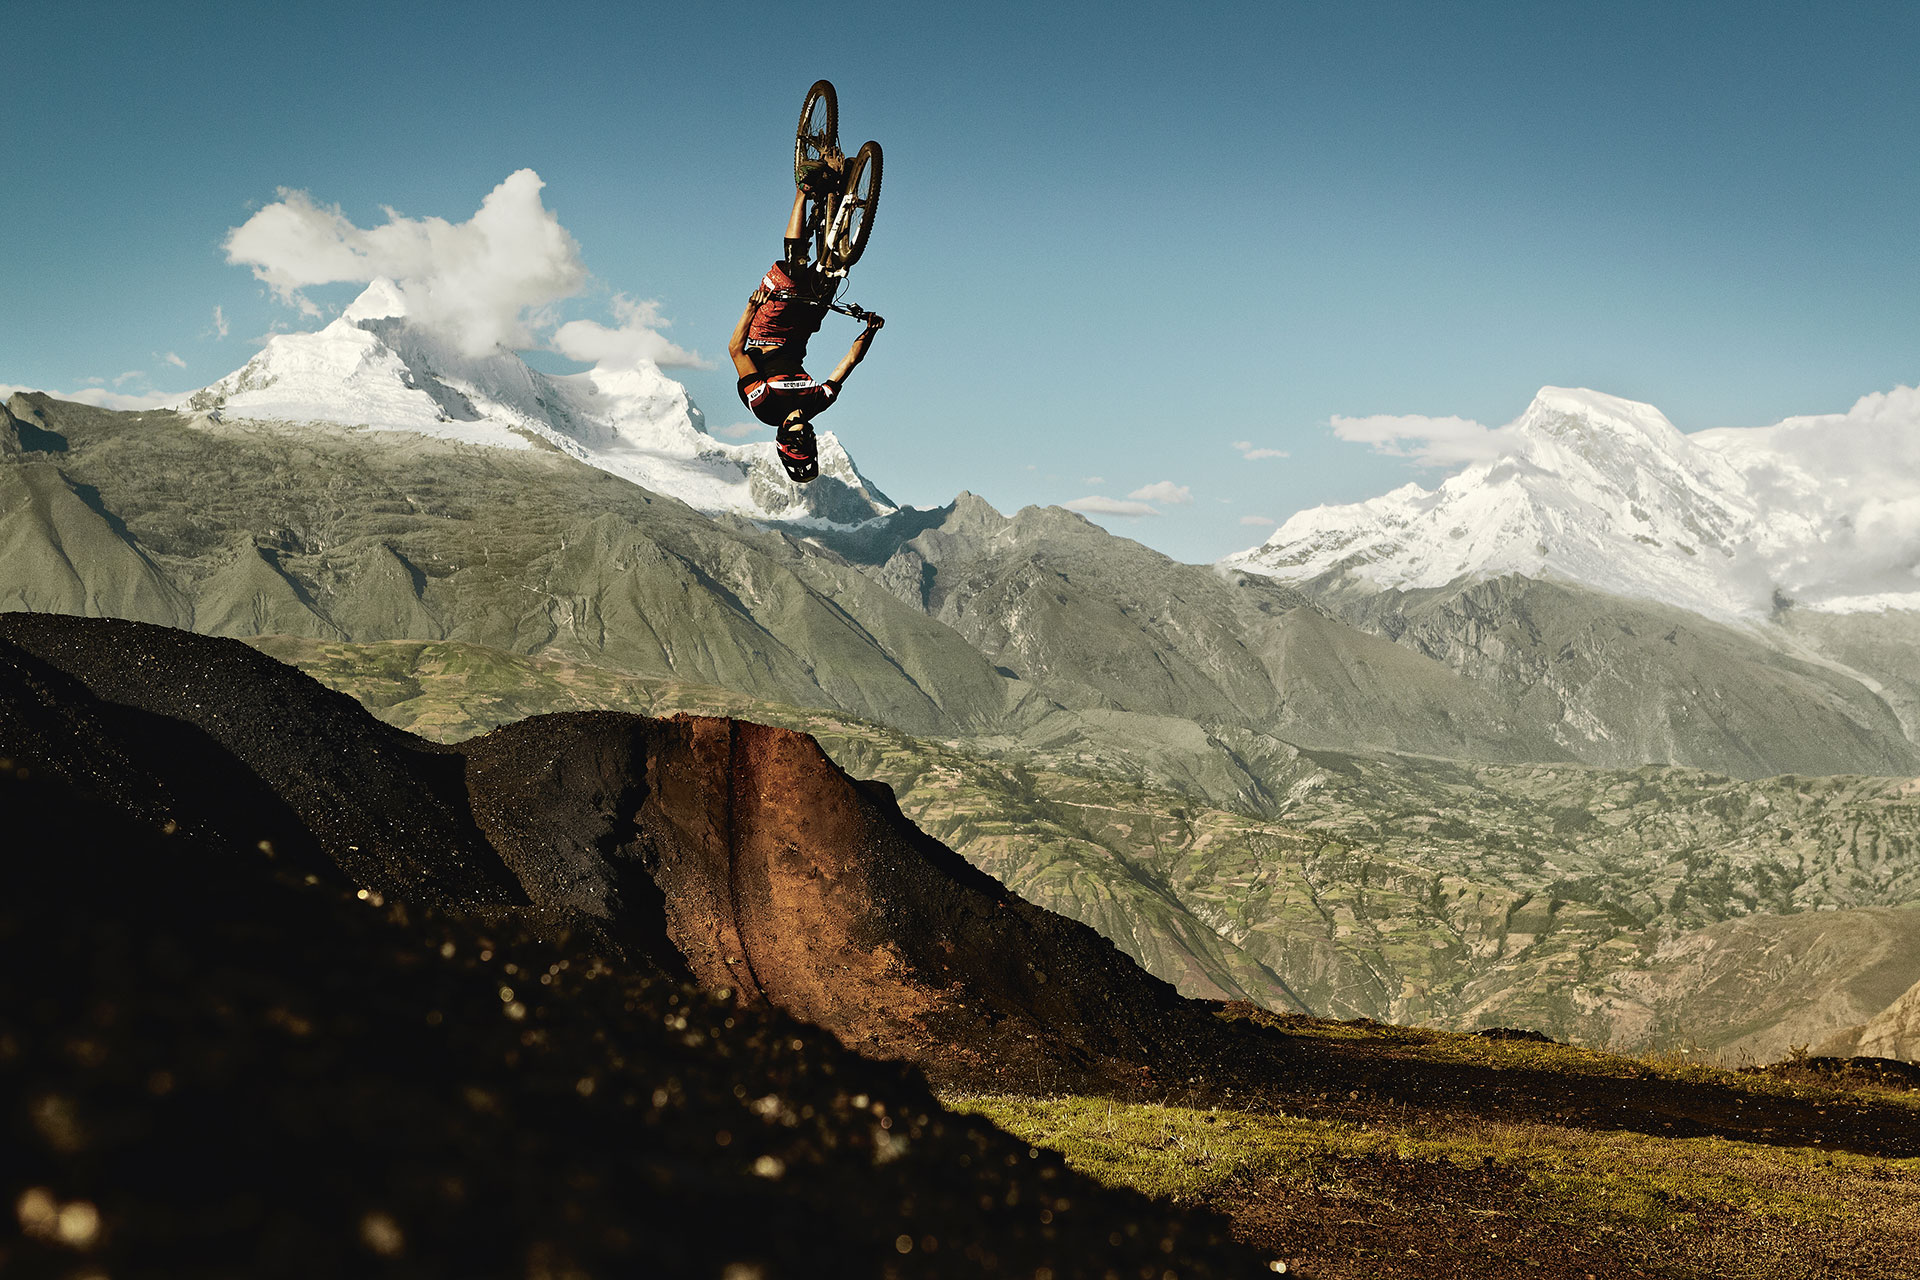 Fotograf Sport Aktion Backflip München Peru Berge Natur Outdoor